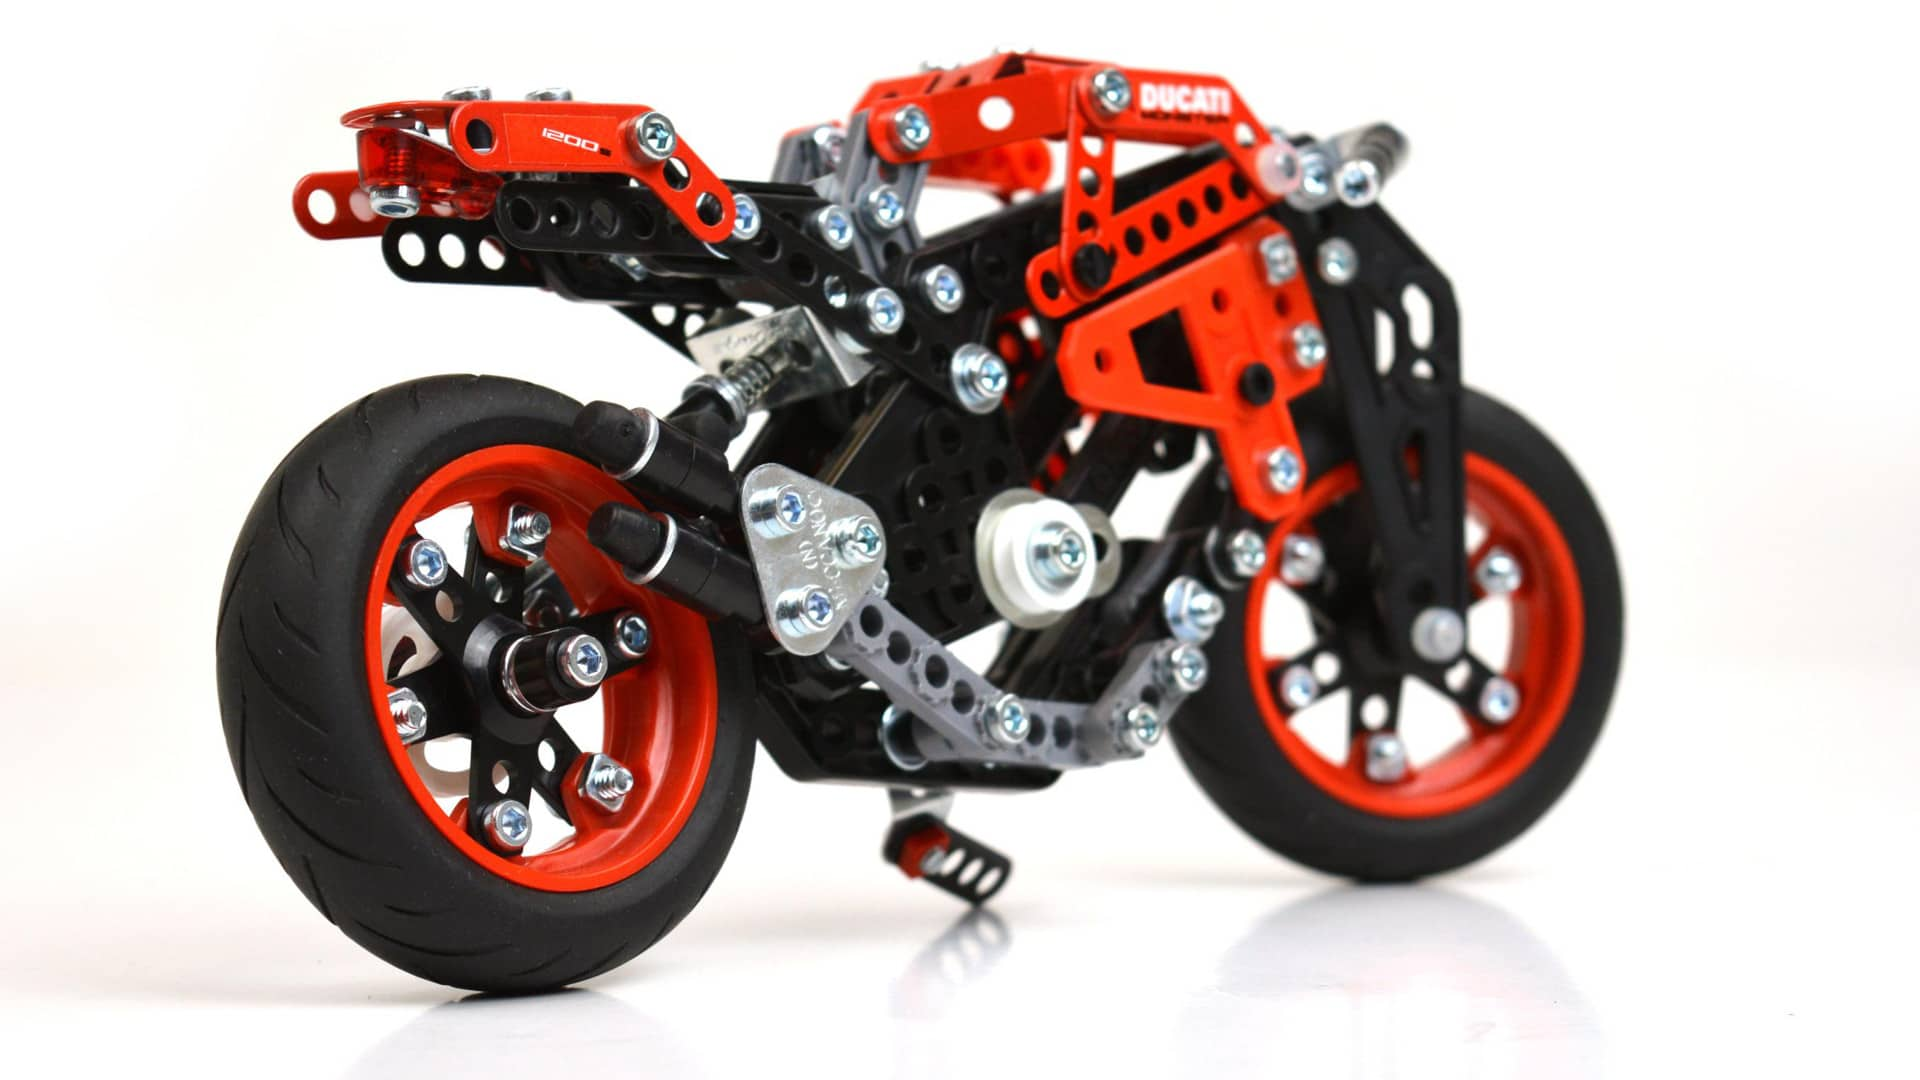 Ducati Monster 1200 Meccano Set